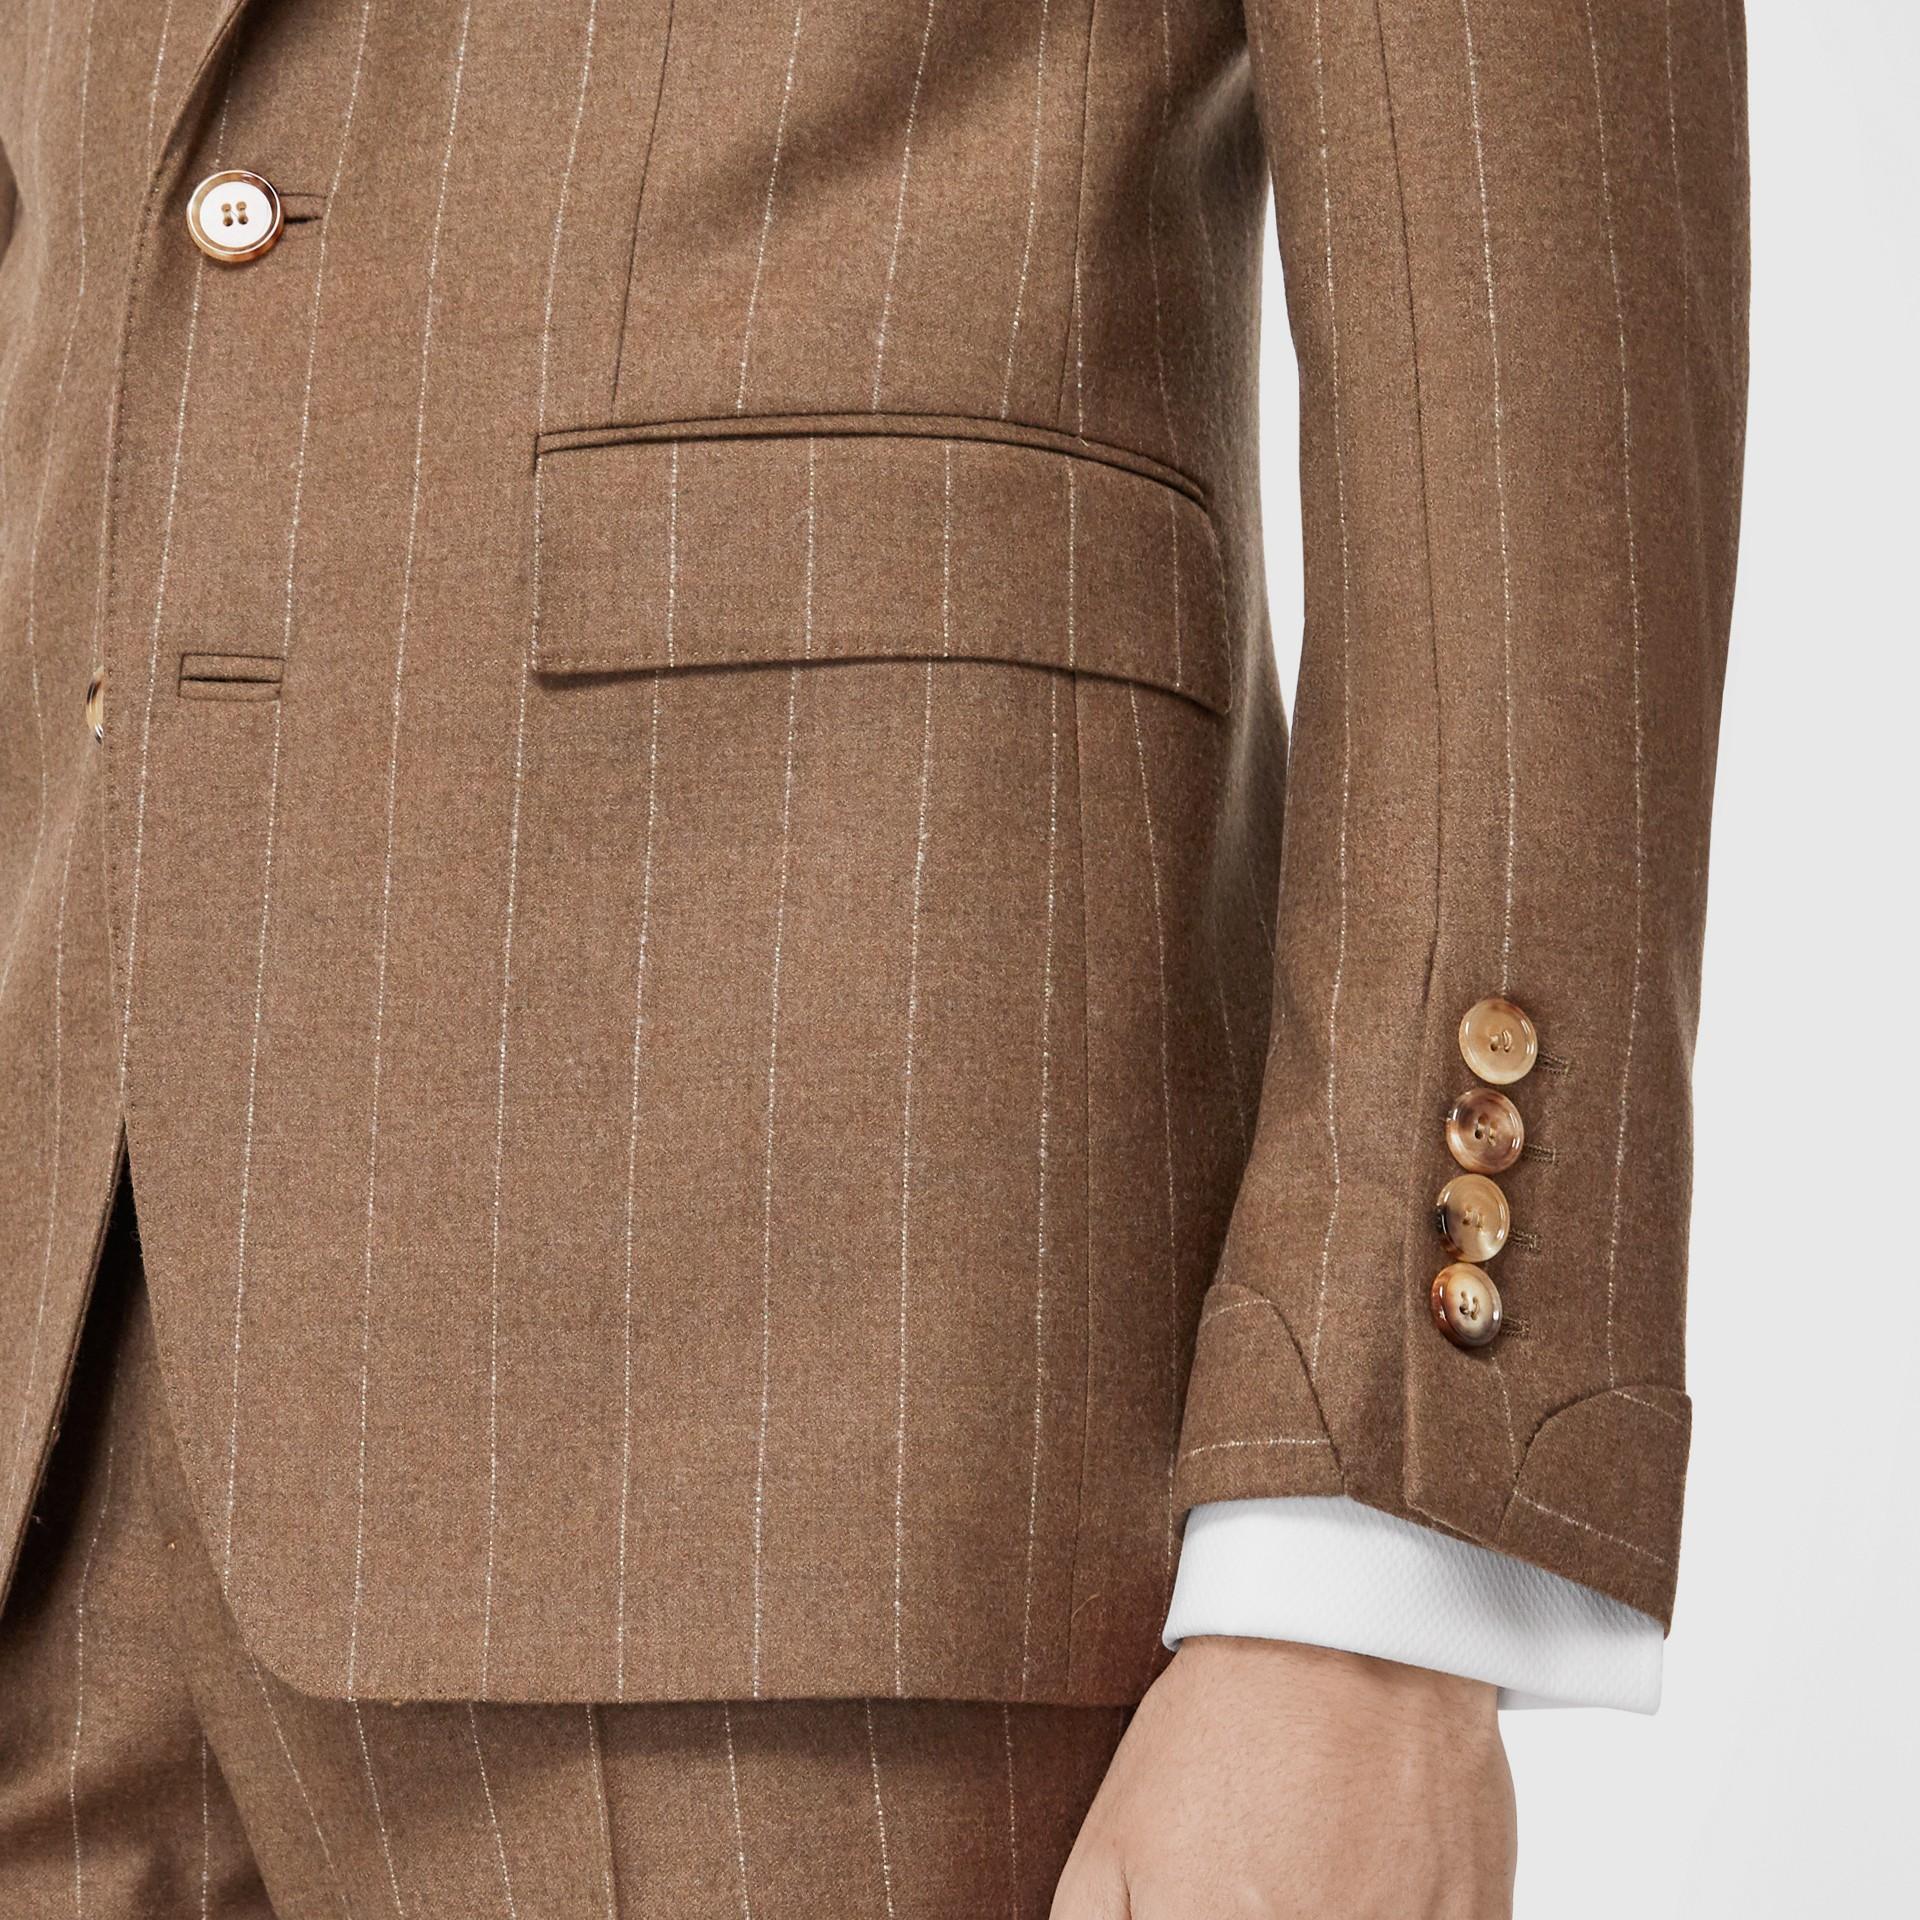 Classic Fit Velvet Trim Wool Cashmere Tailored Jacket in Dark Tan - Men | Burberry - gallery image 3